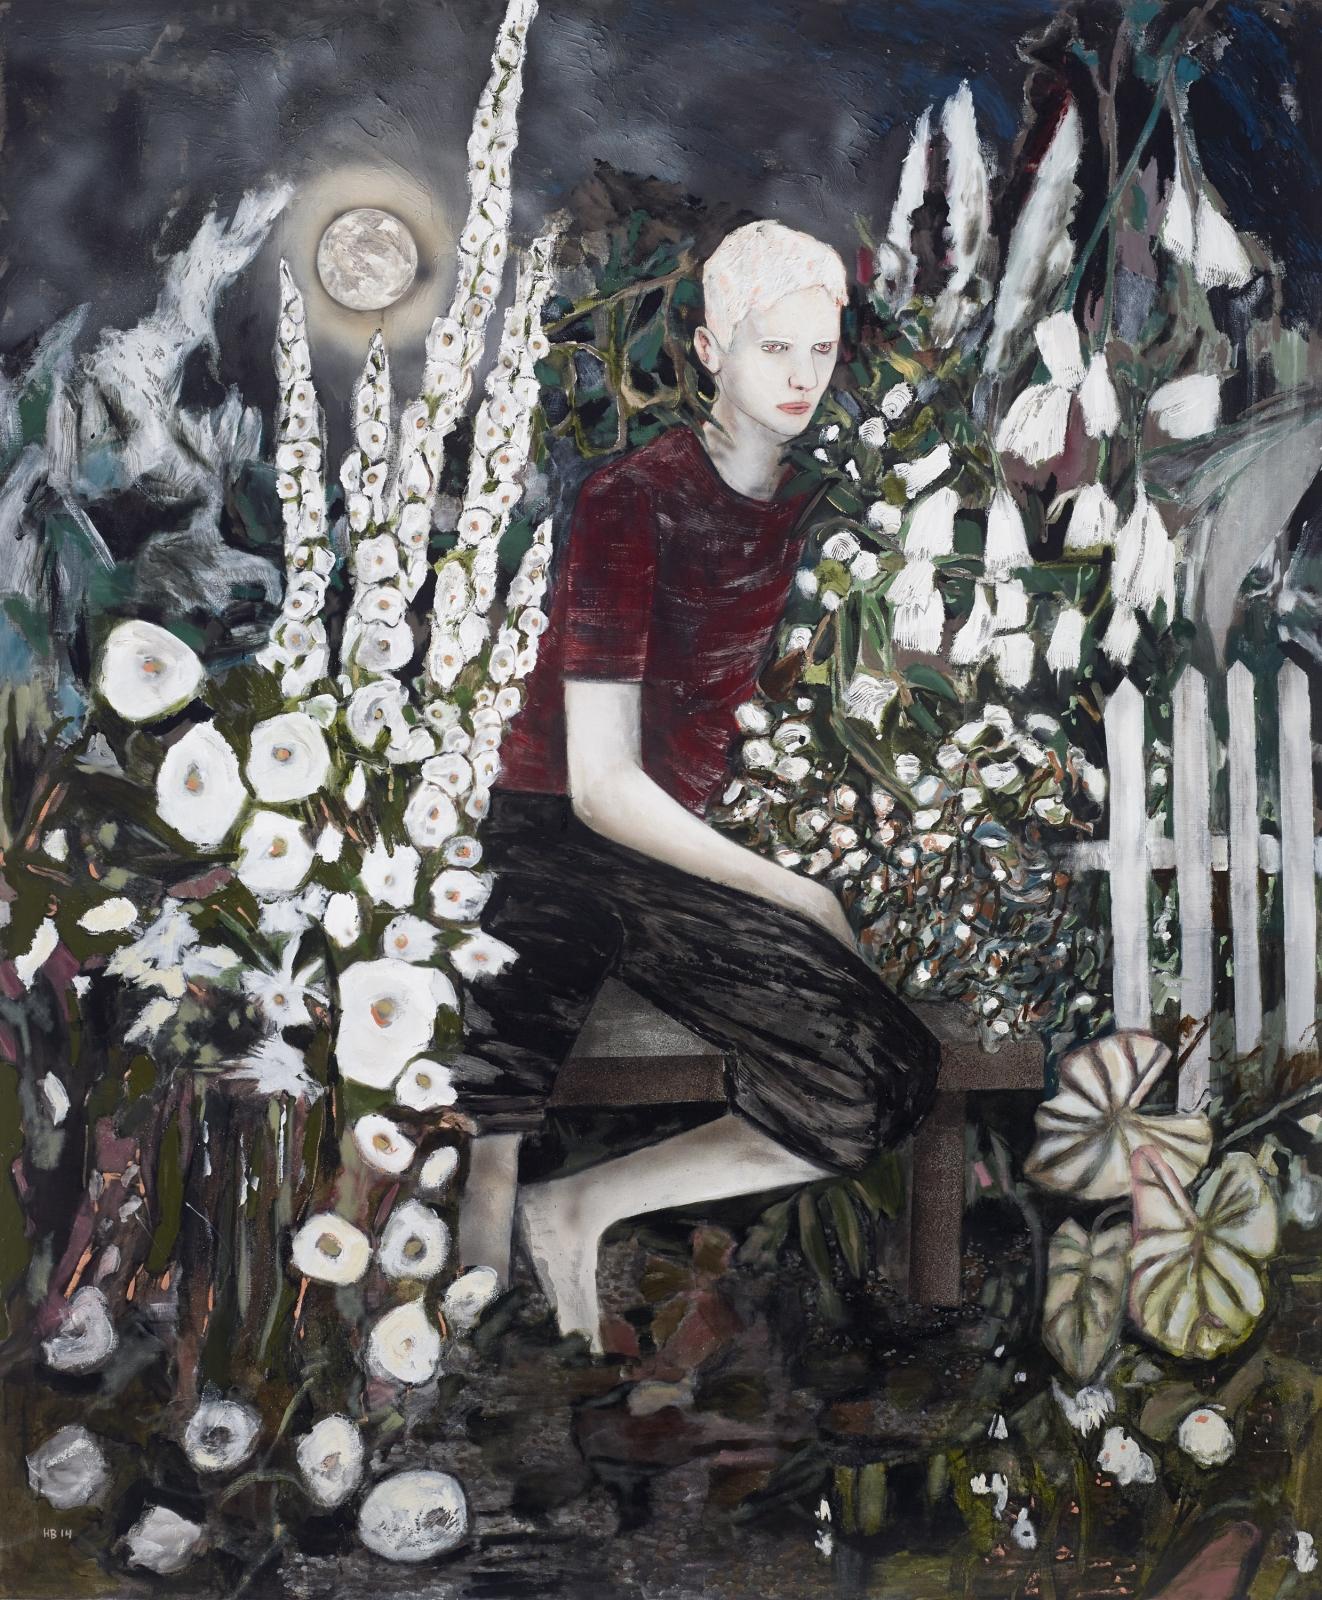 HERNAN BAS, Albino in a moonlight garden, 2014